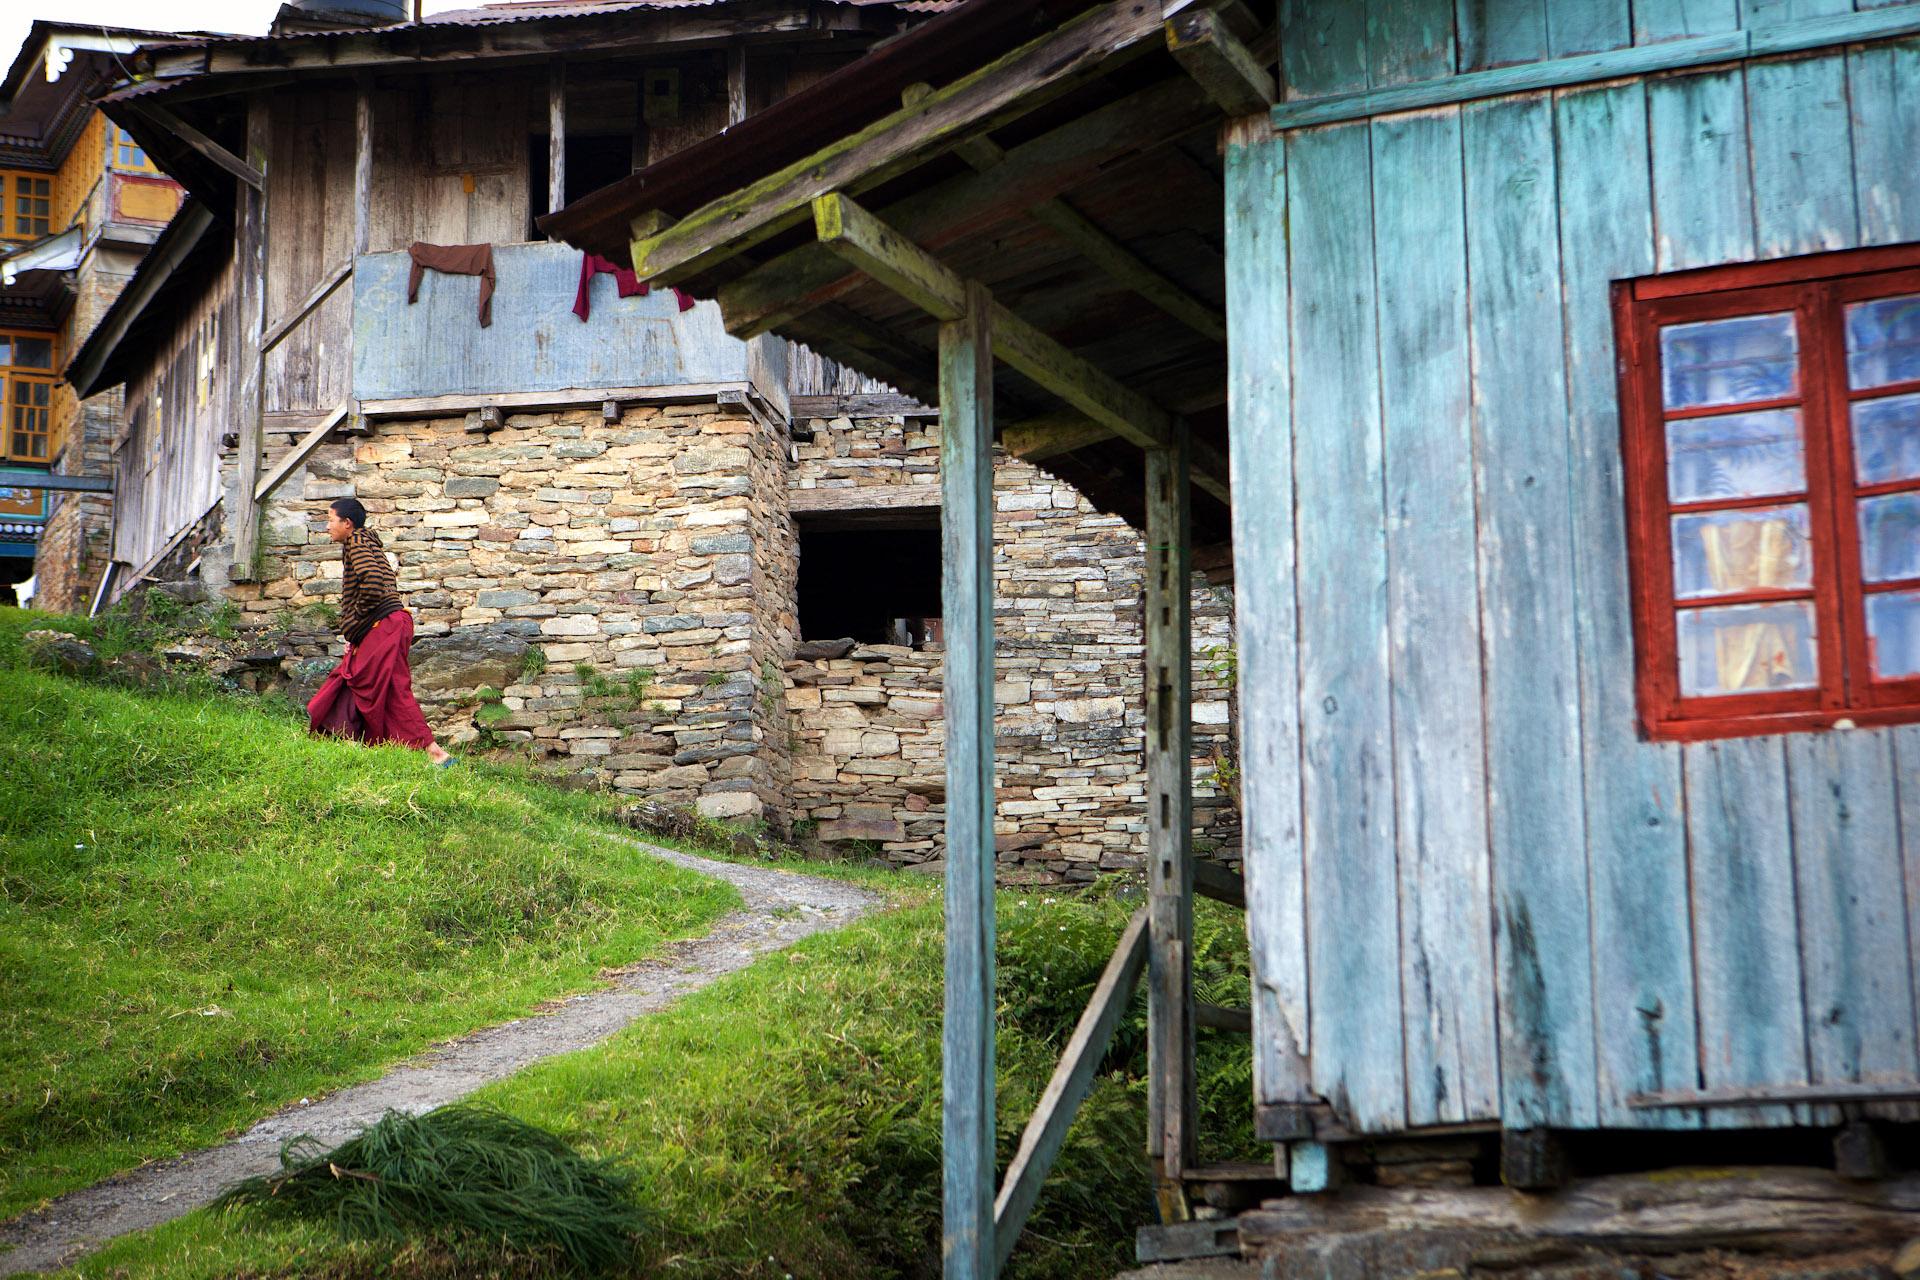 India-Sikkim-Travel-Pemayangtse-Monastery-Monk.JPG